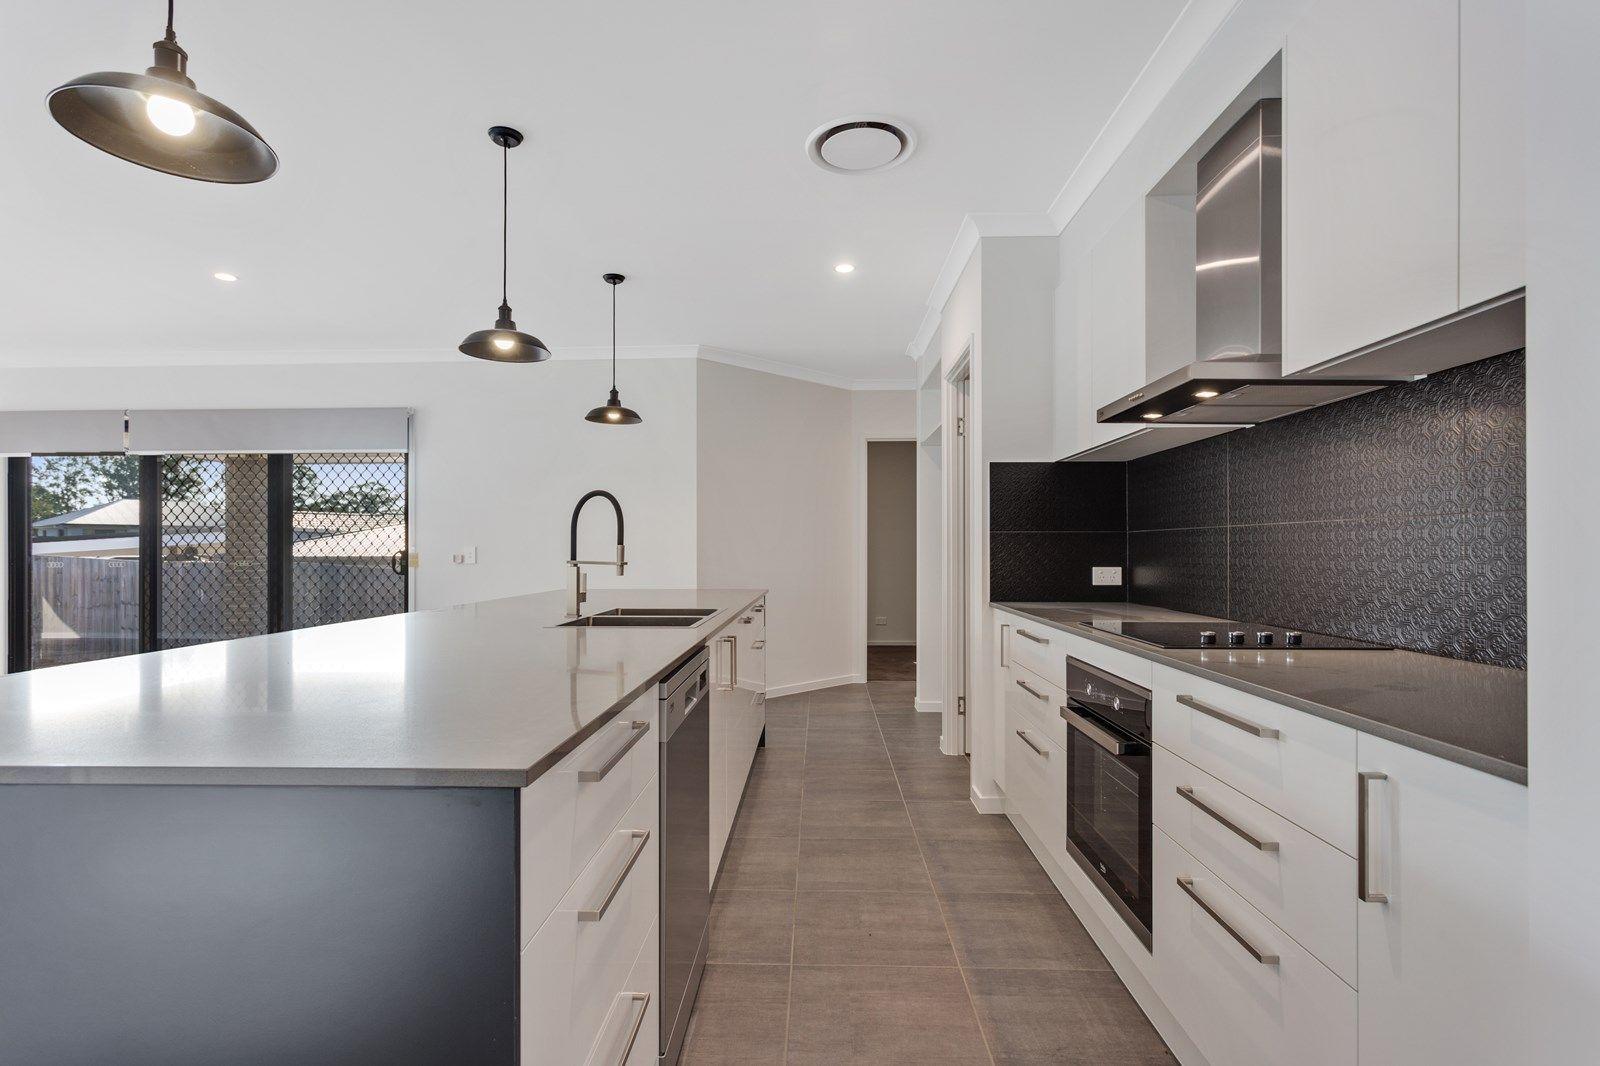 Lot 7 Cedarwood Place, Landsborough QLD 4550, Image 1